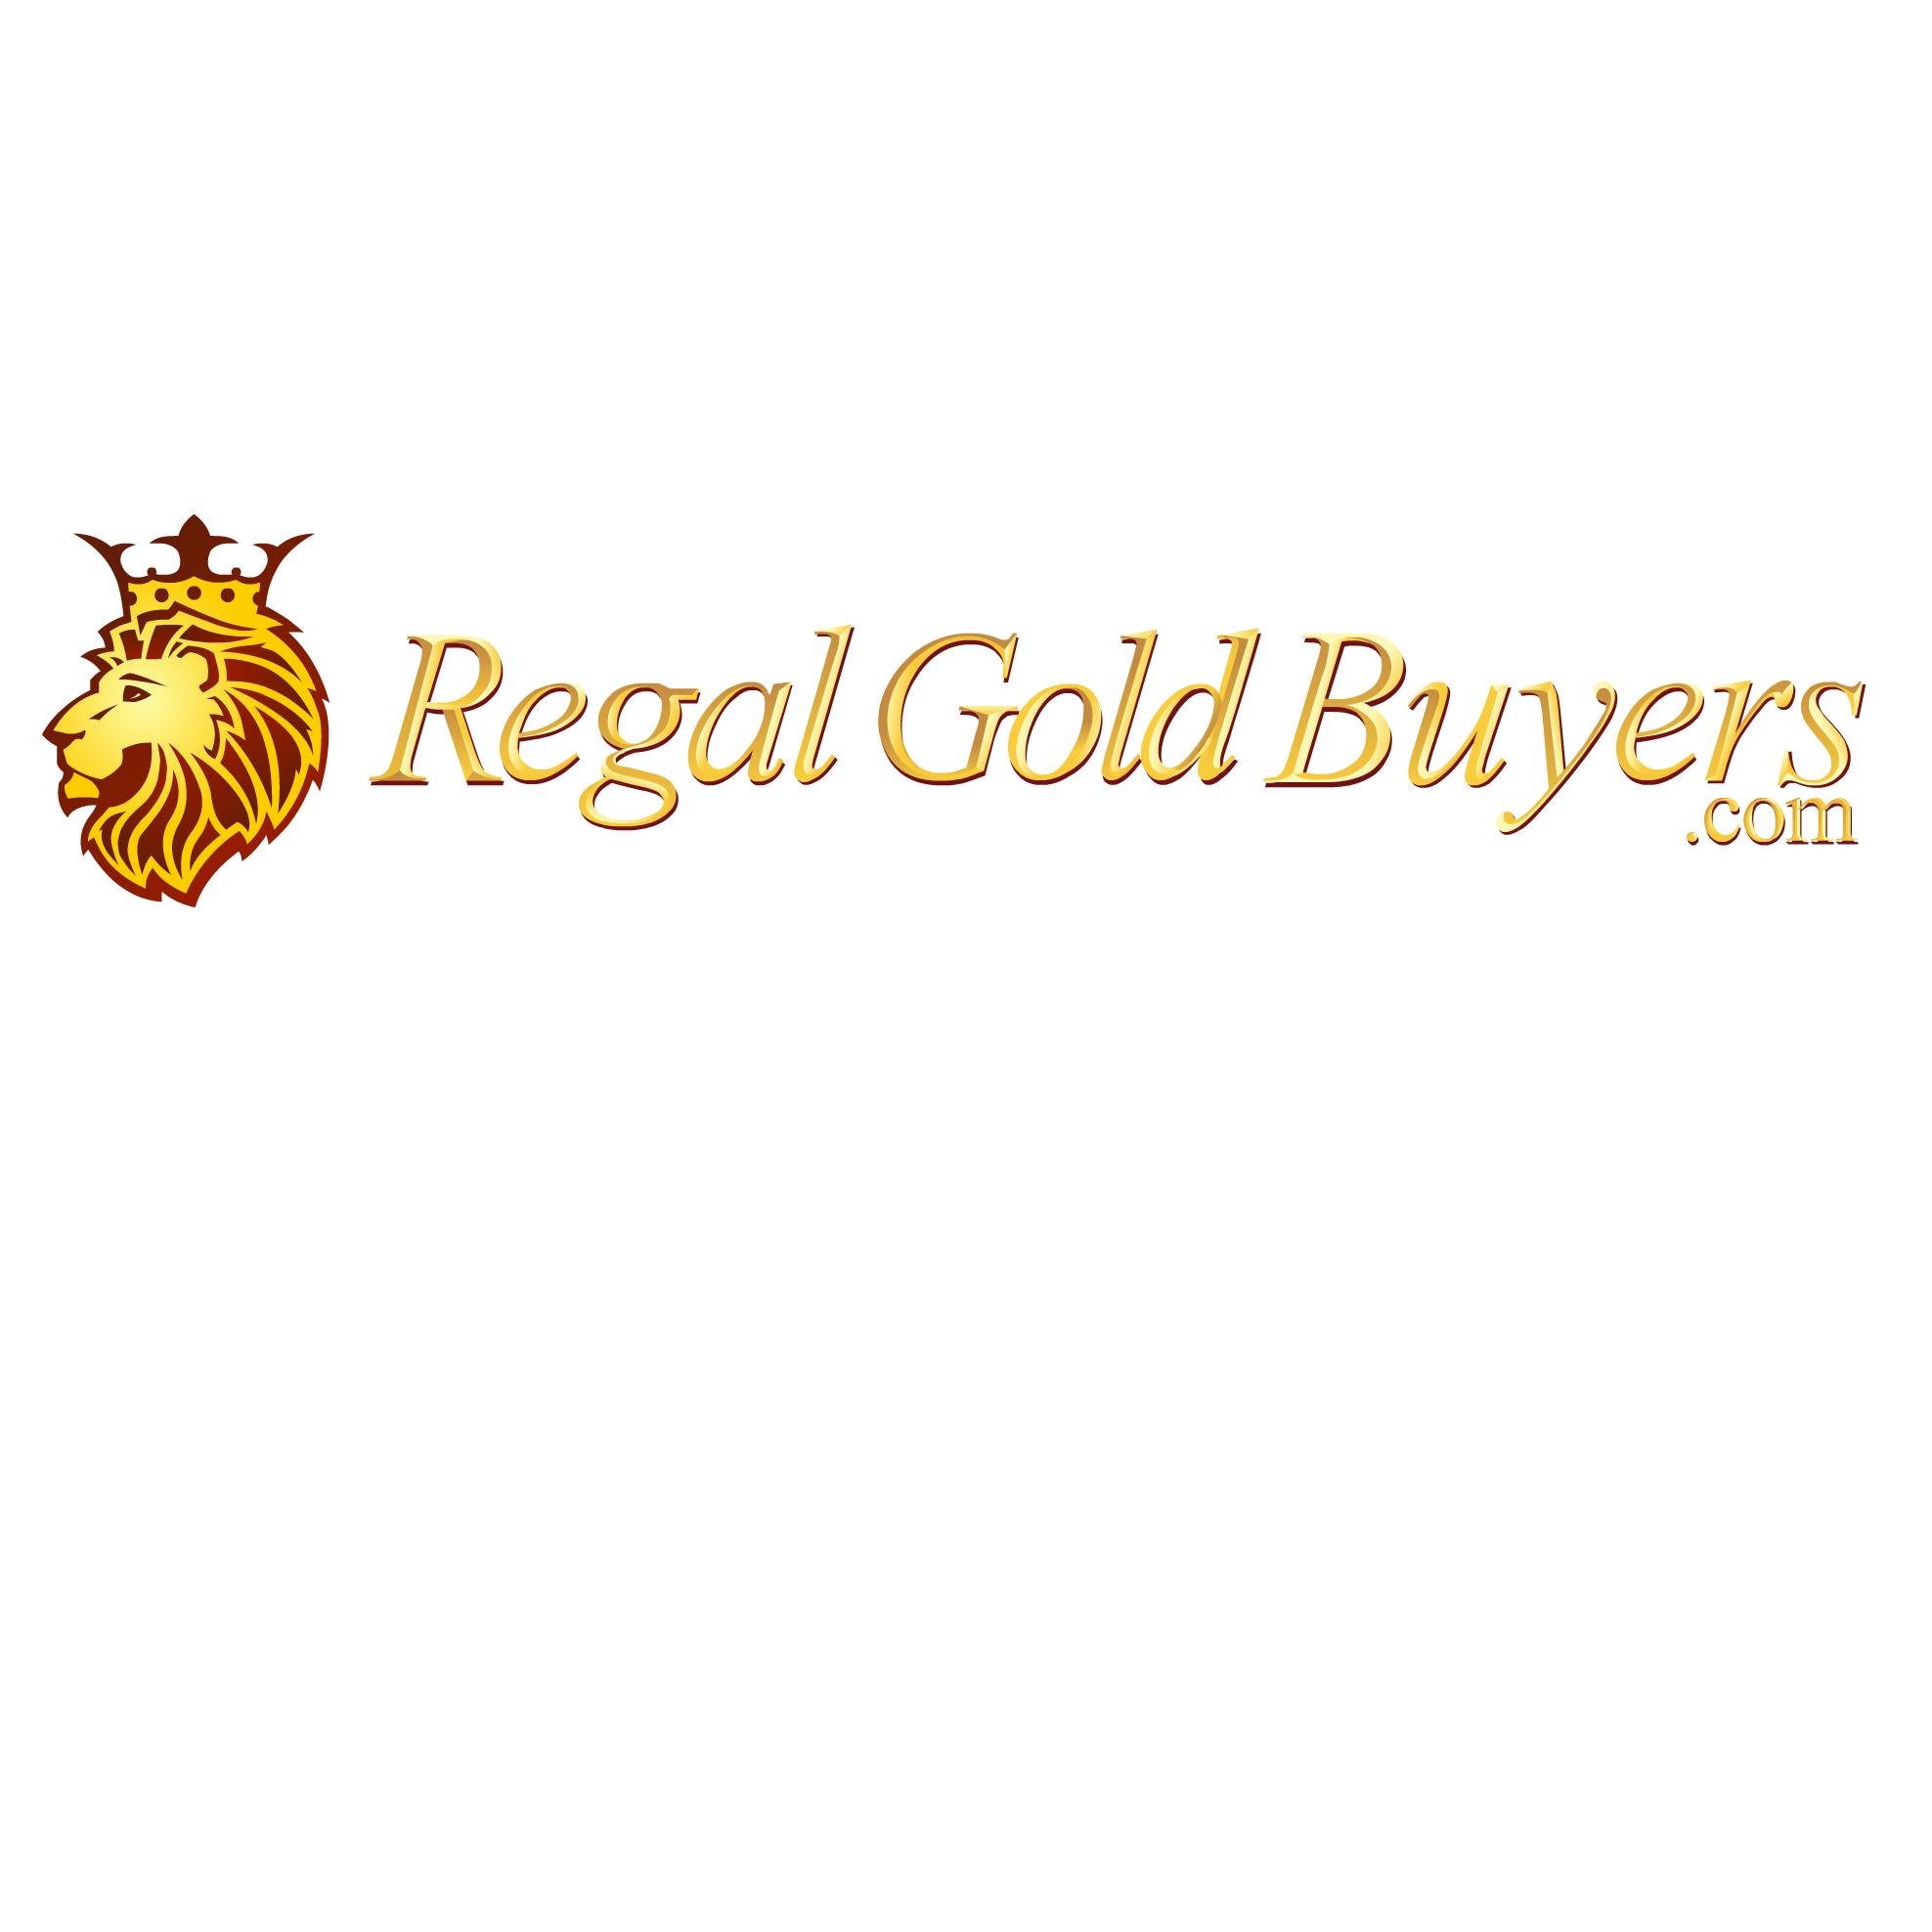 Regal Gold Buyers